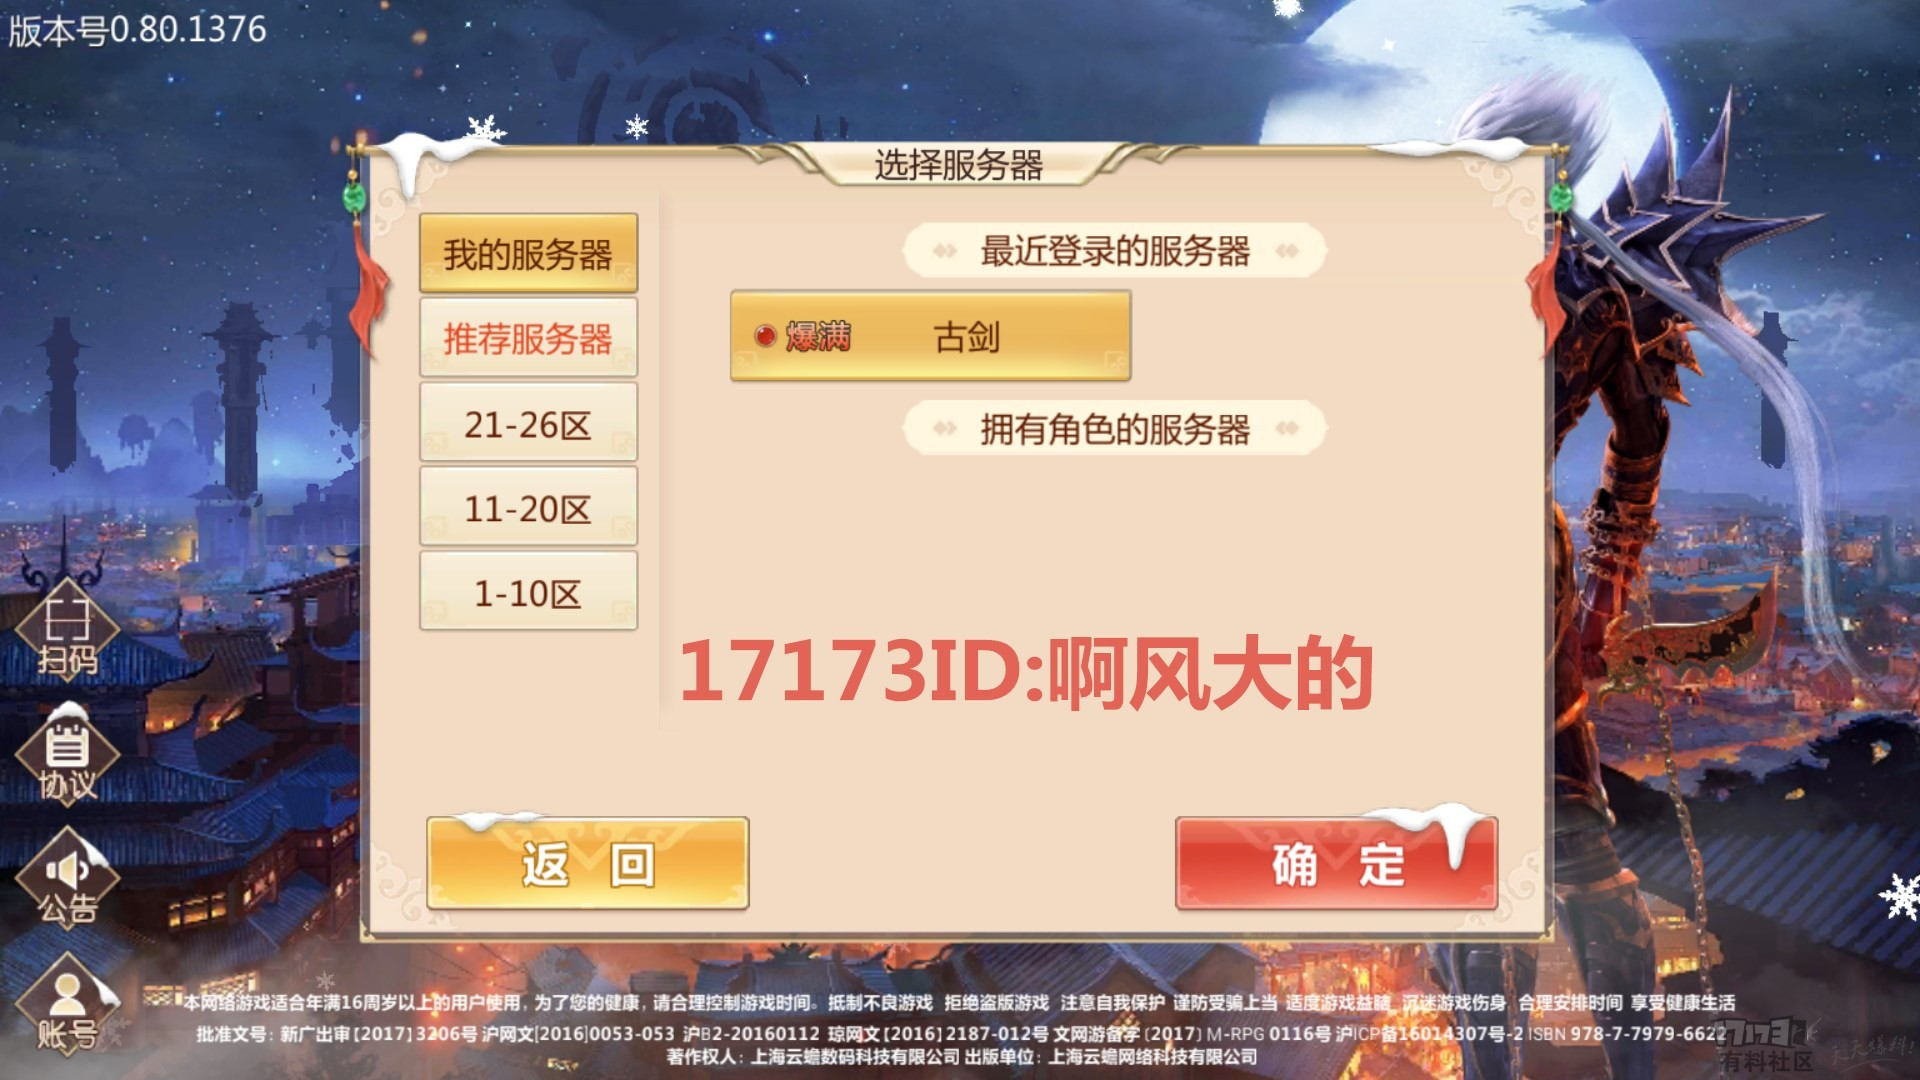 Screenshot_2018-01-19-18-18-23-924_com.ycgame.t11_副本.jpg